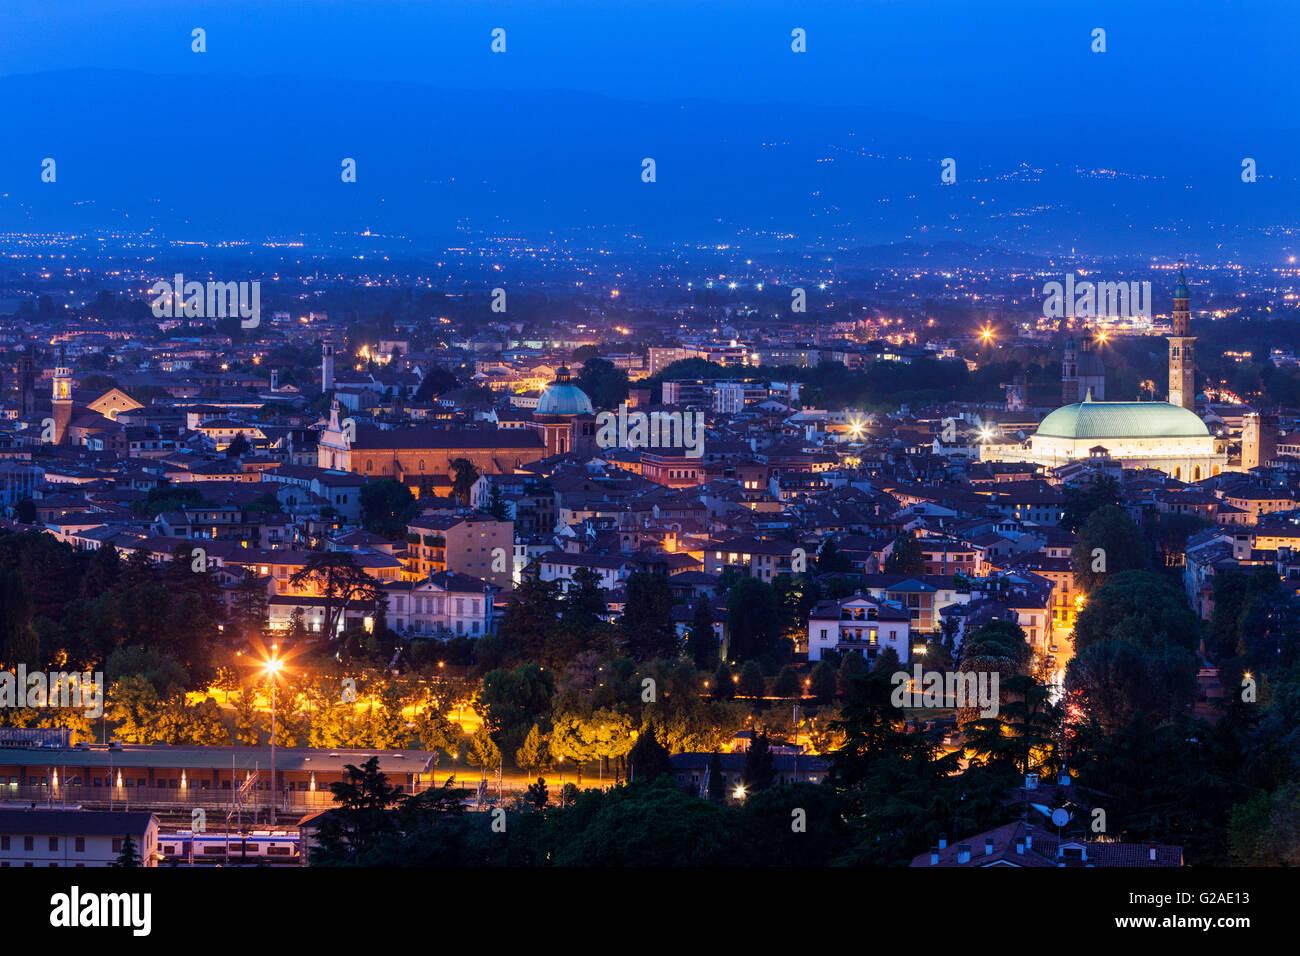 Architecture of Vicenza Vicenza, Veneto, Italy - Stock Image